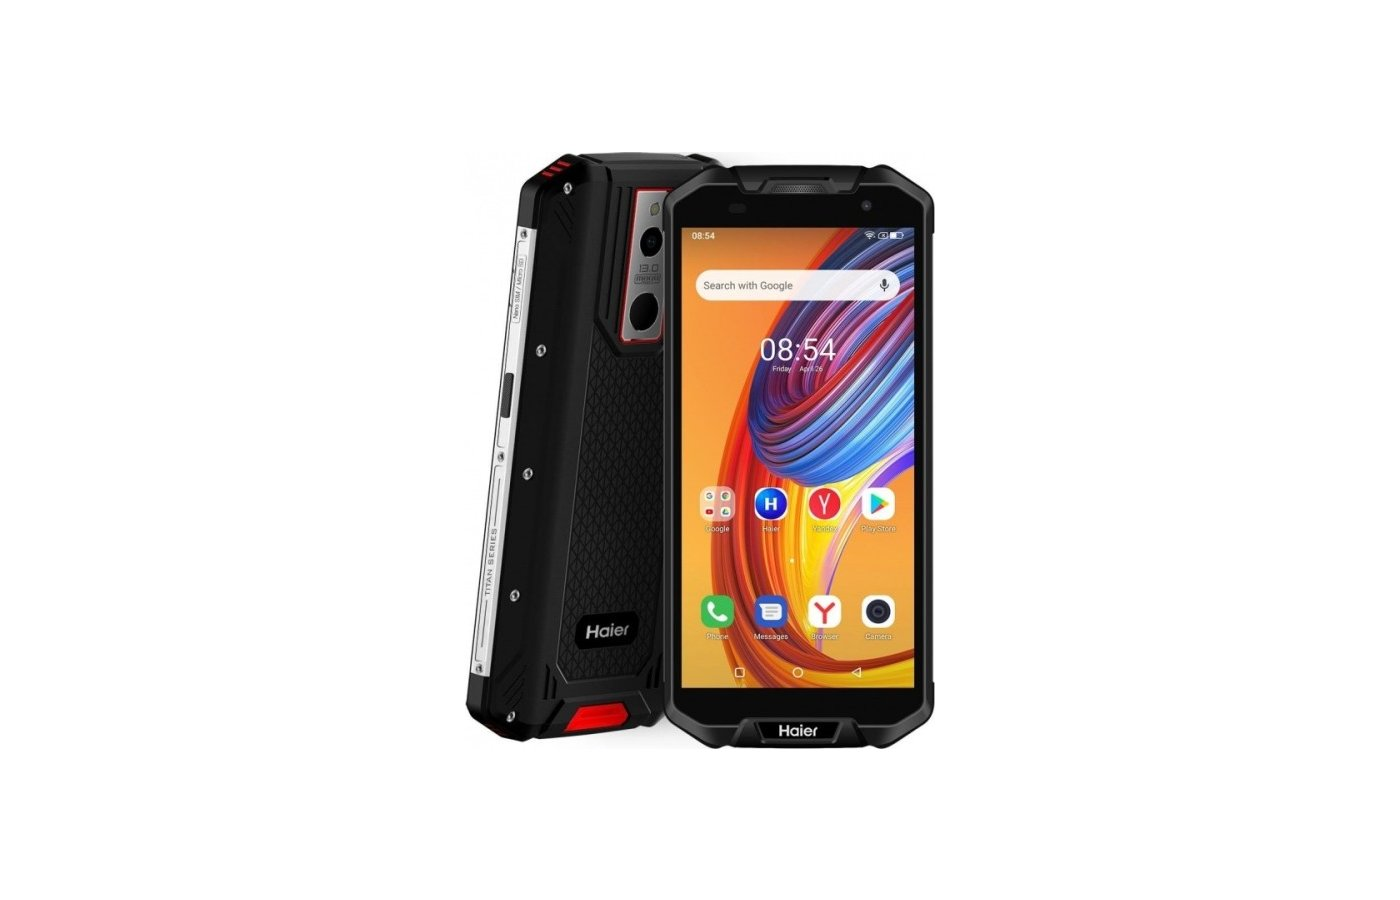 Смартфон Haier Titan T1 5 2Gb / 16Gb LTE 2sim Black...